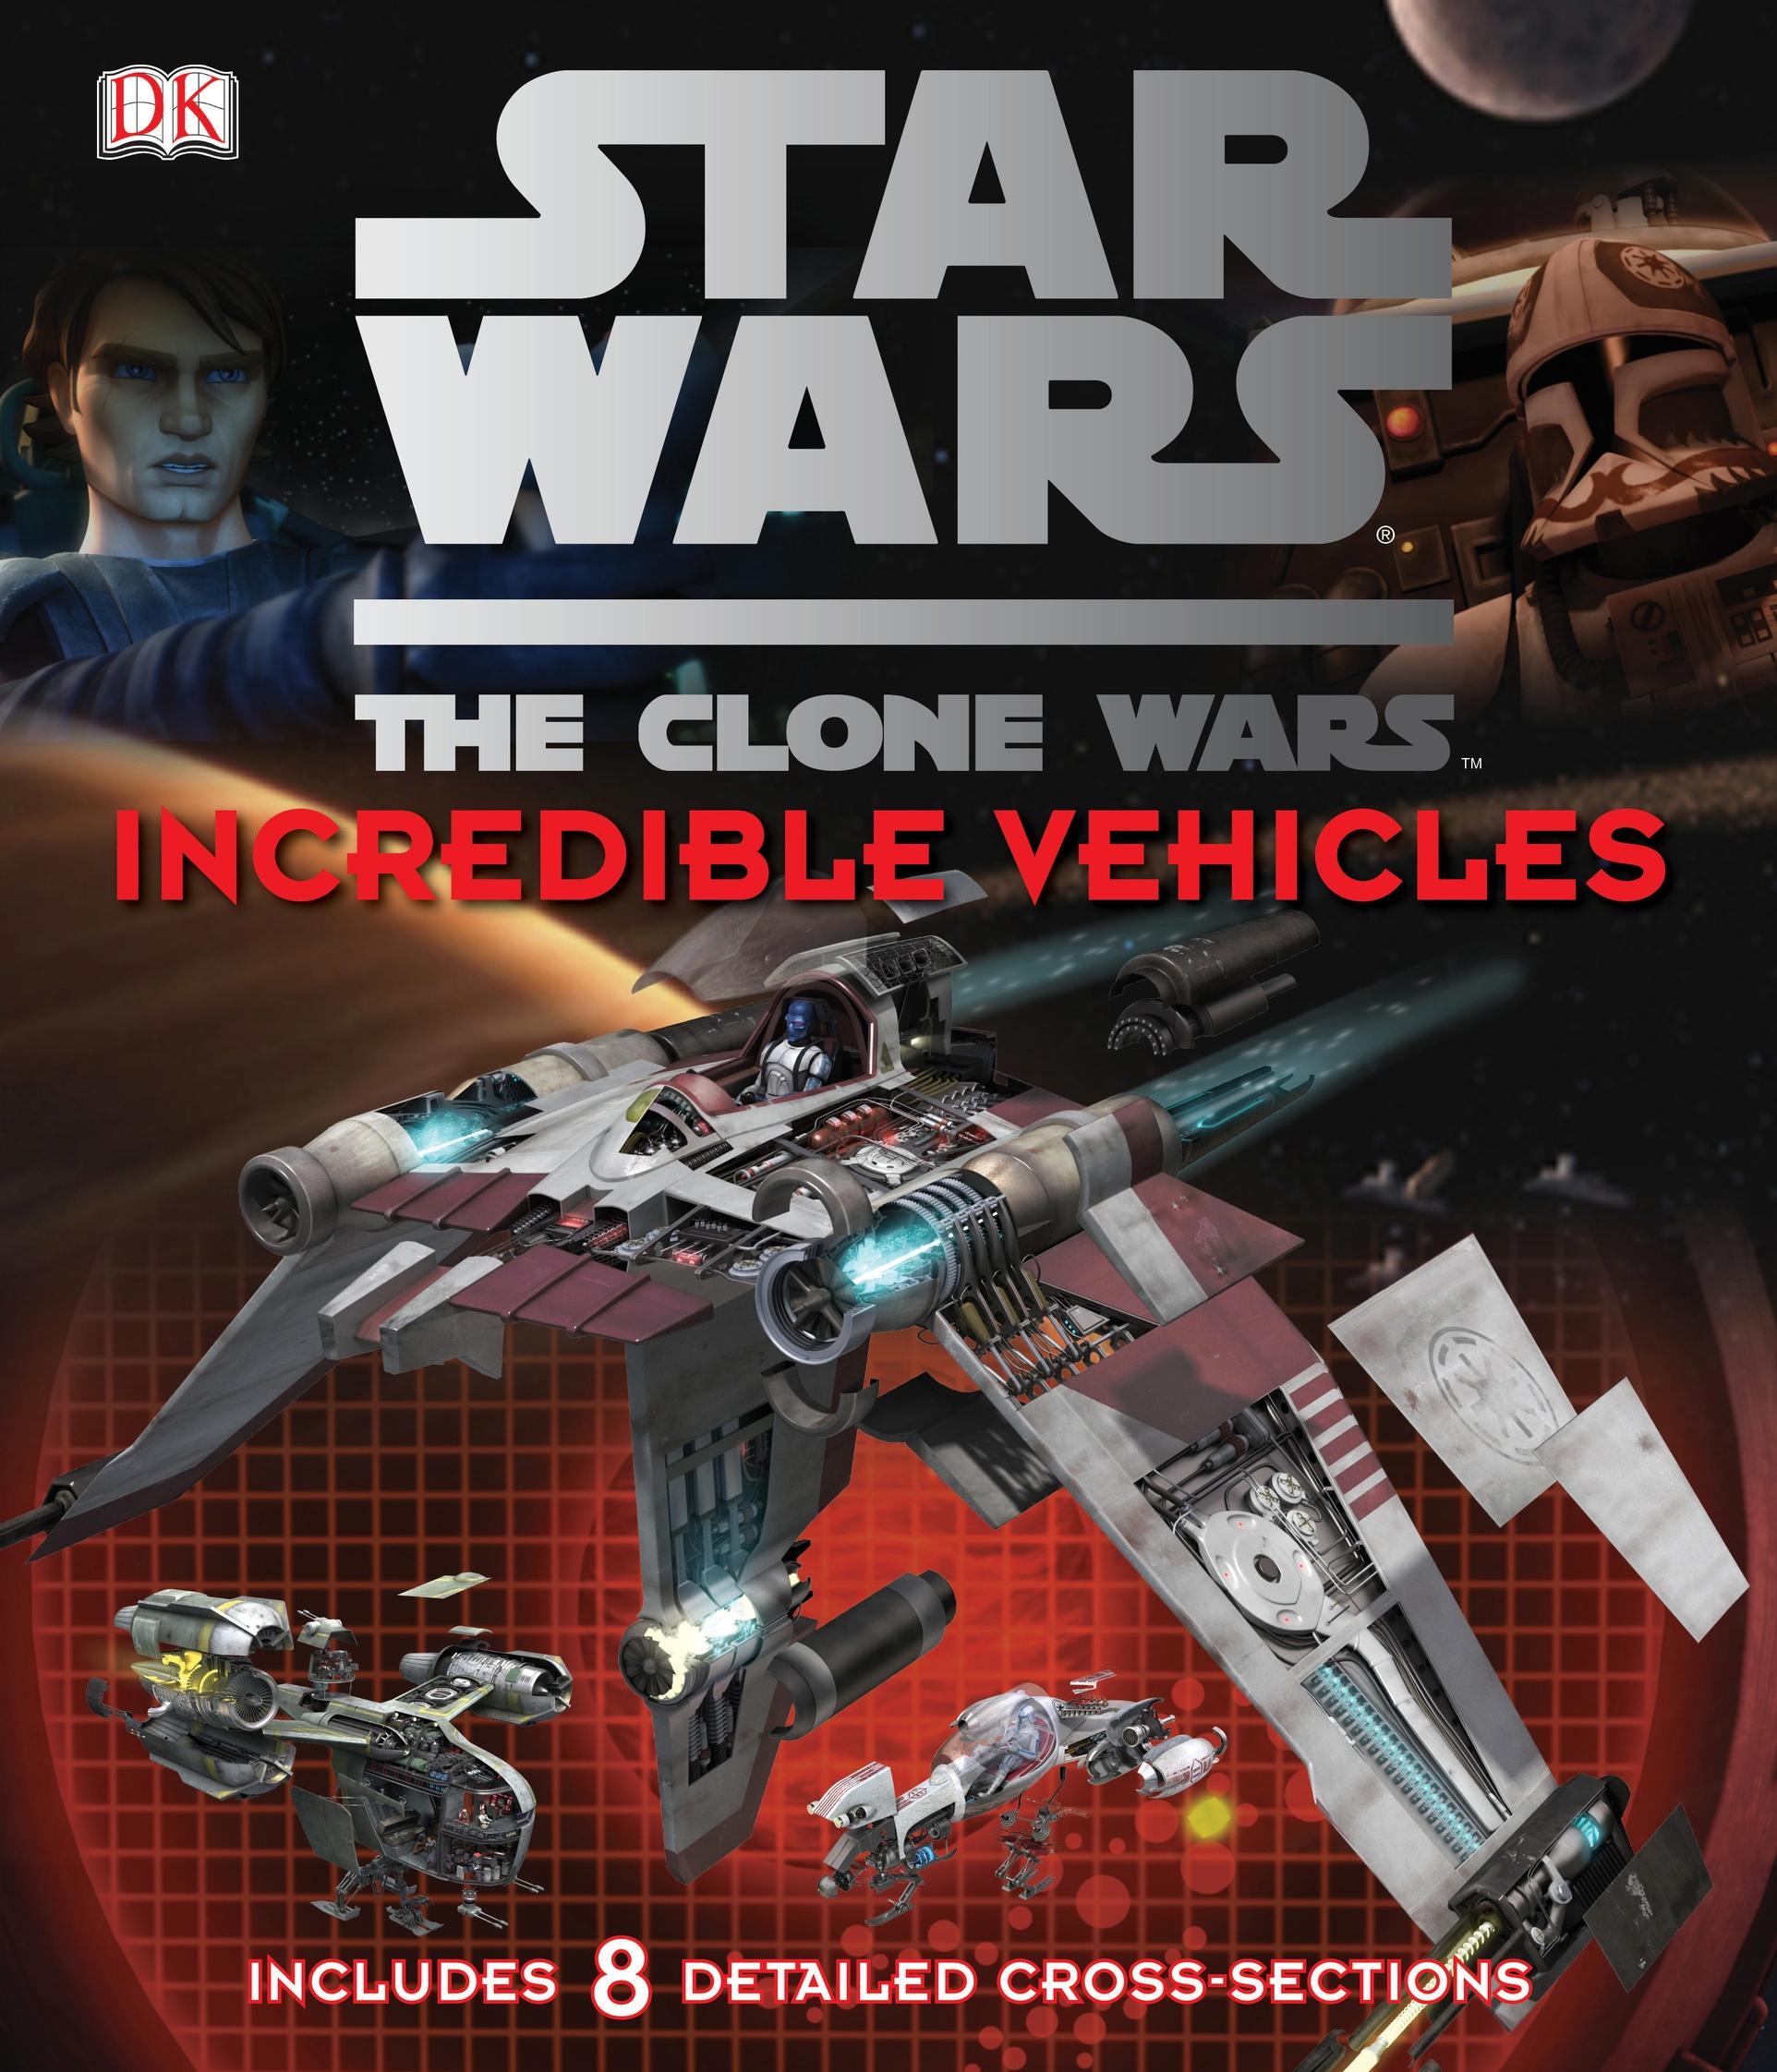 Lego star wars iii the clone wars vehicle info - Star Wars The Clone Wars Incredible Vehicles Wookieepedia Fandom Powered By Wikia